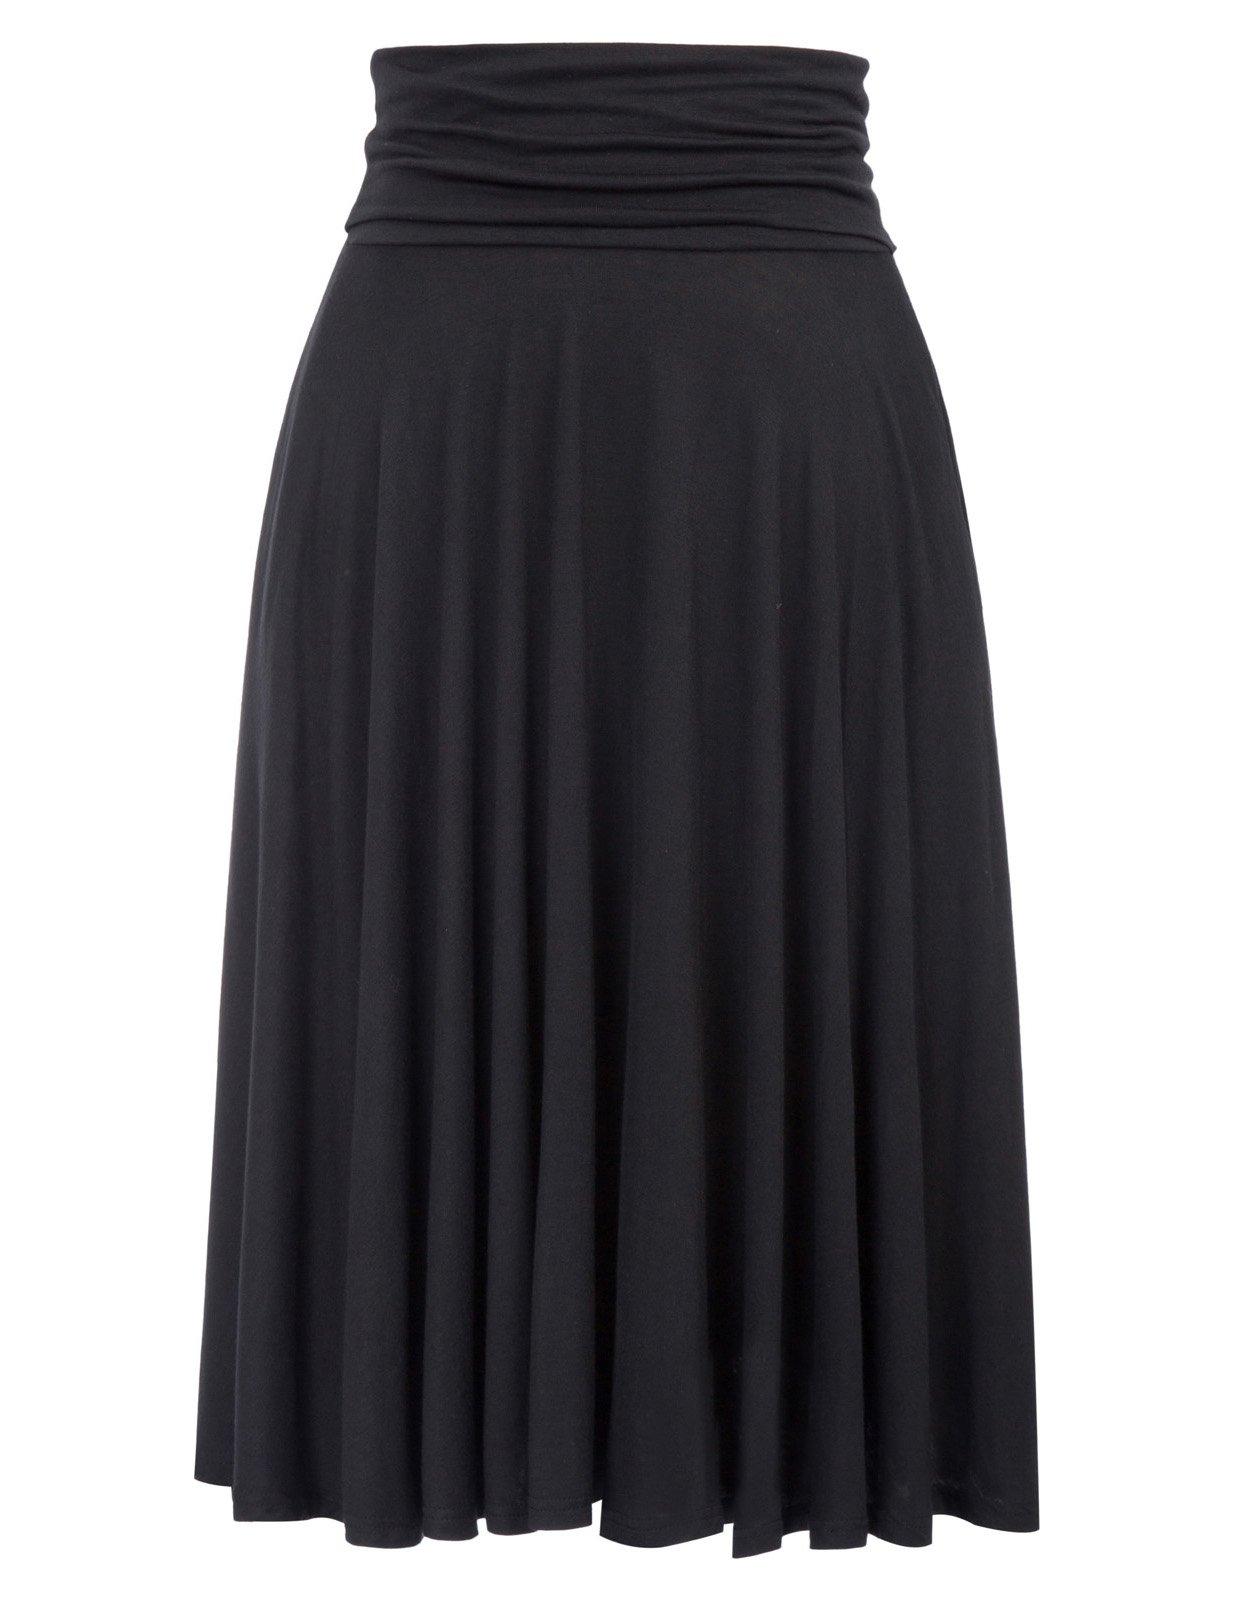 Kate Kasin Stretchy High Waist Midi Skirts for Women Knee Length (L,Black)